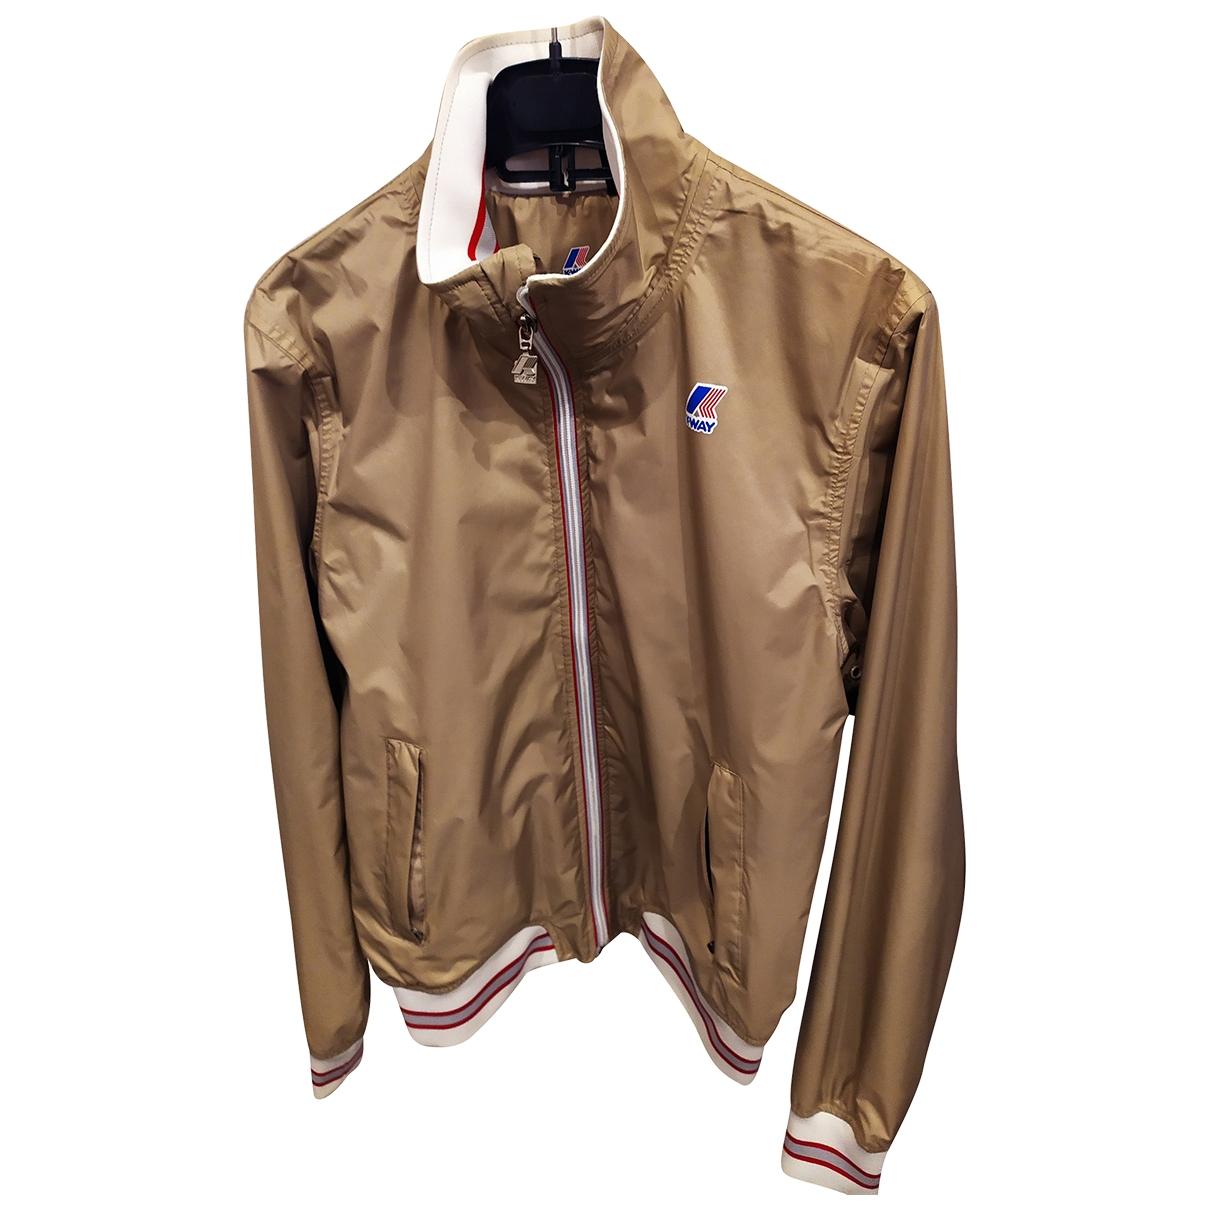 K-way \N Beige jacket  for Men M International